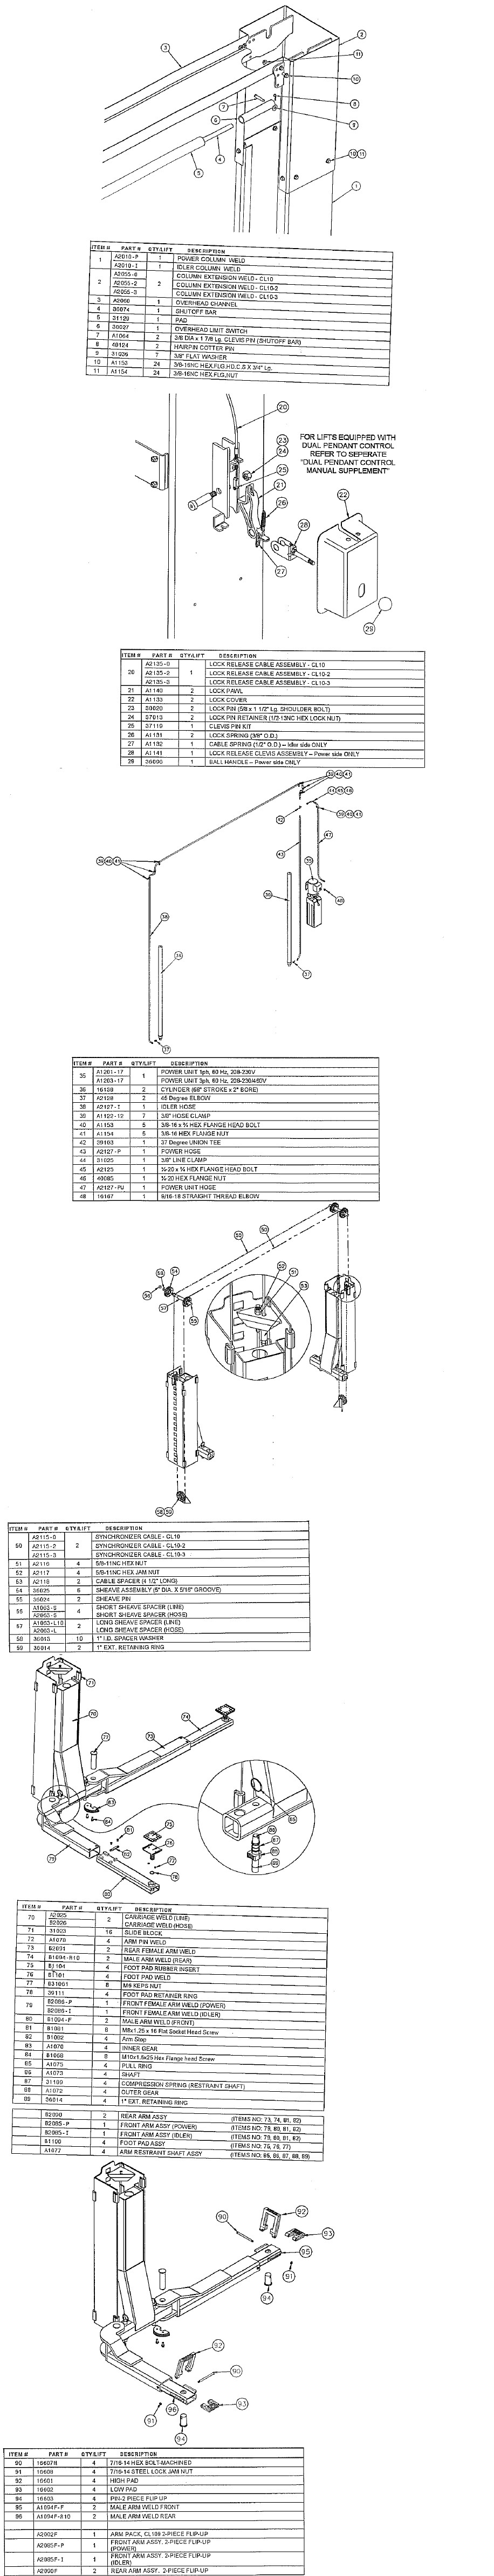 Coats Tire Machine Parts Diagram Equipment City Of Coats Tire Machine Parts Diagram